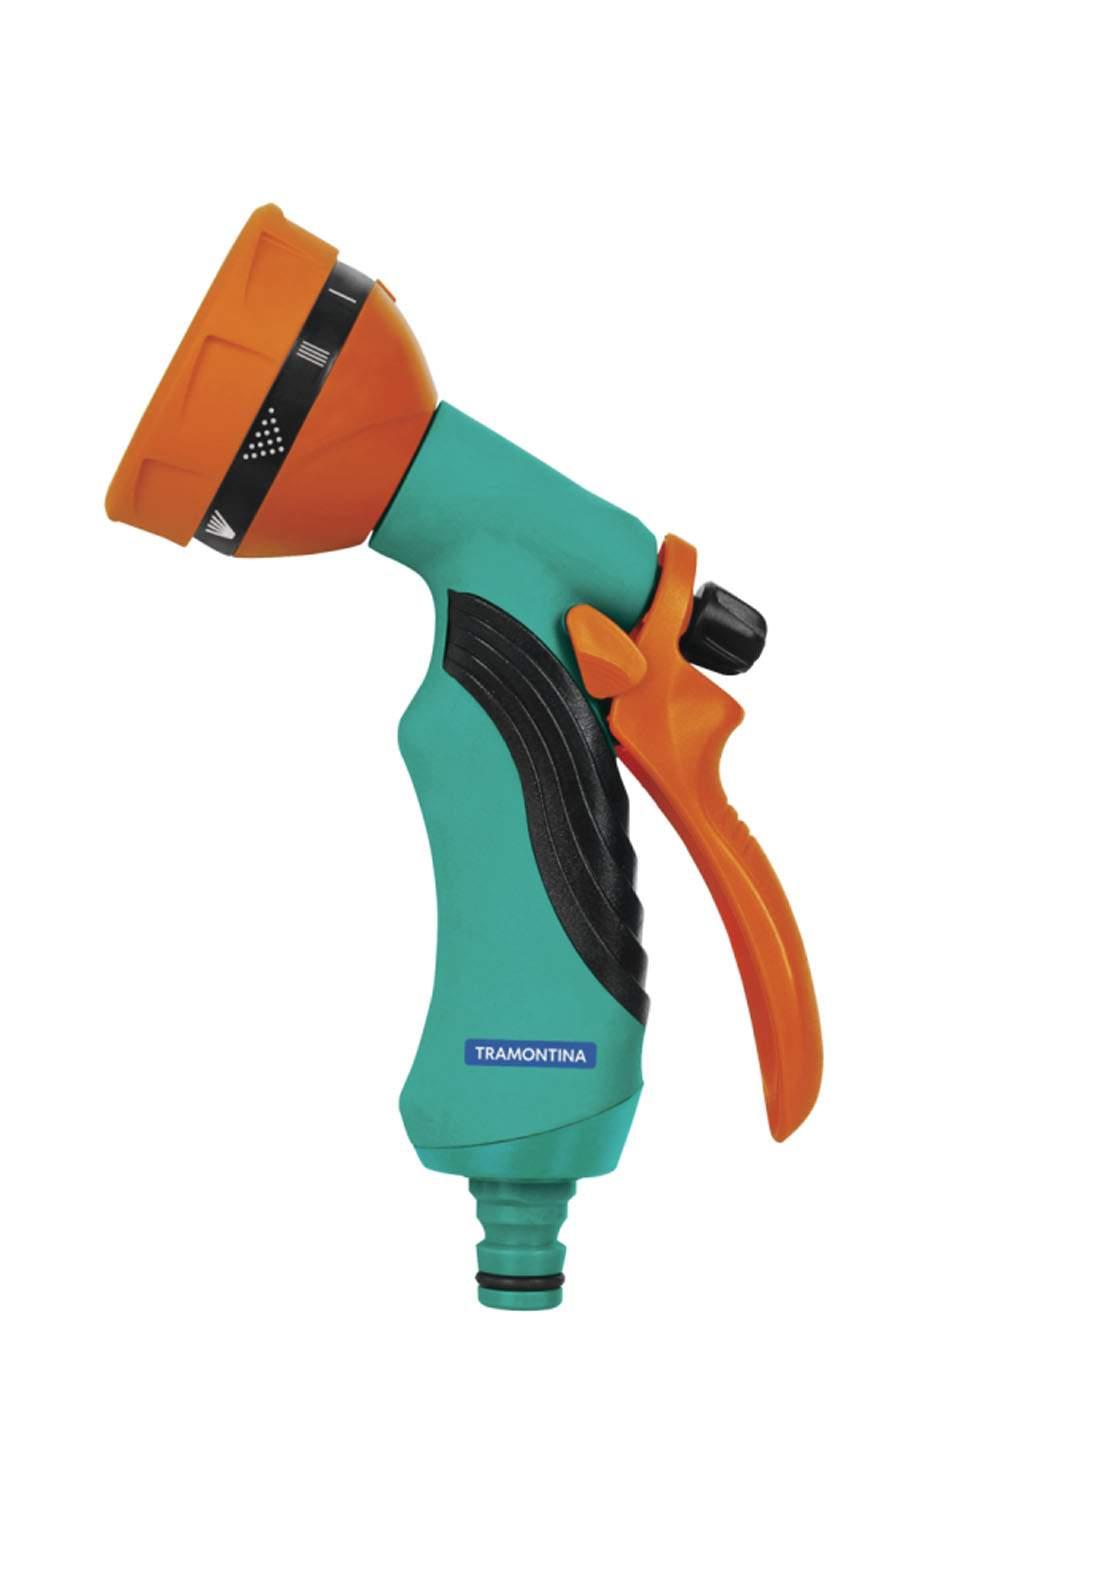 Tramontina '78520/500  The muzzle of the gun measures 16.7 cm مرشة مياه 16.7 سم